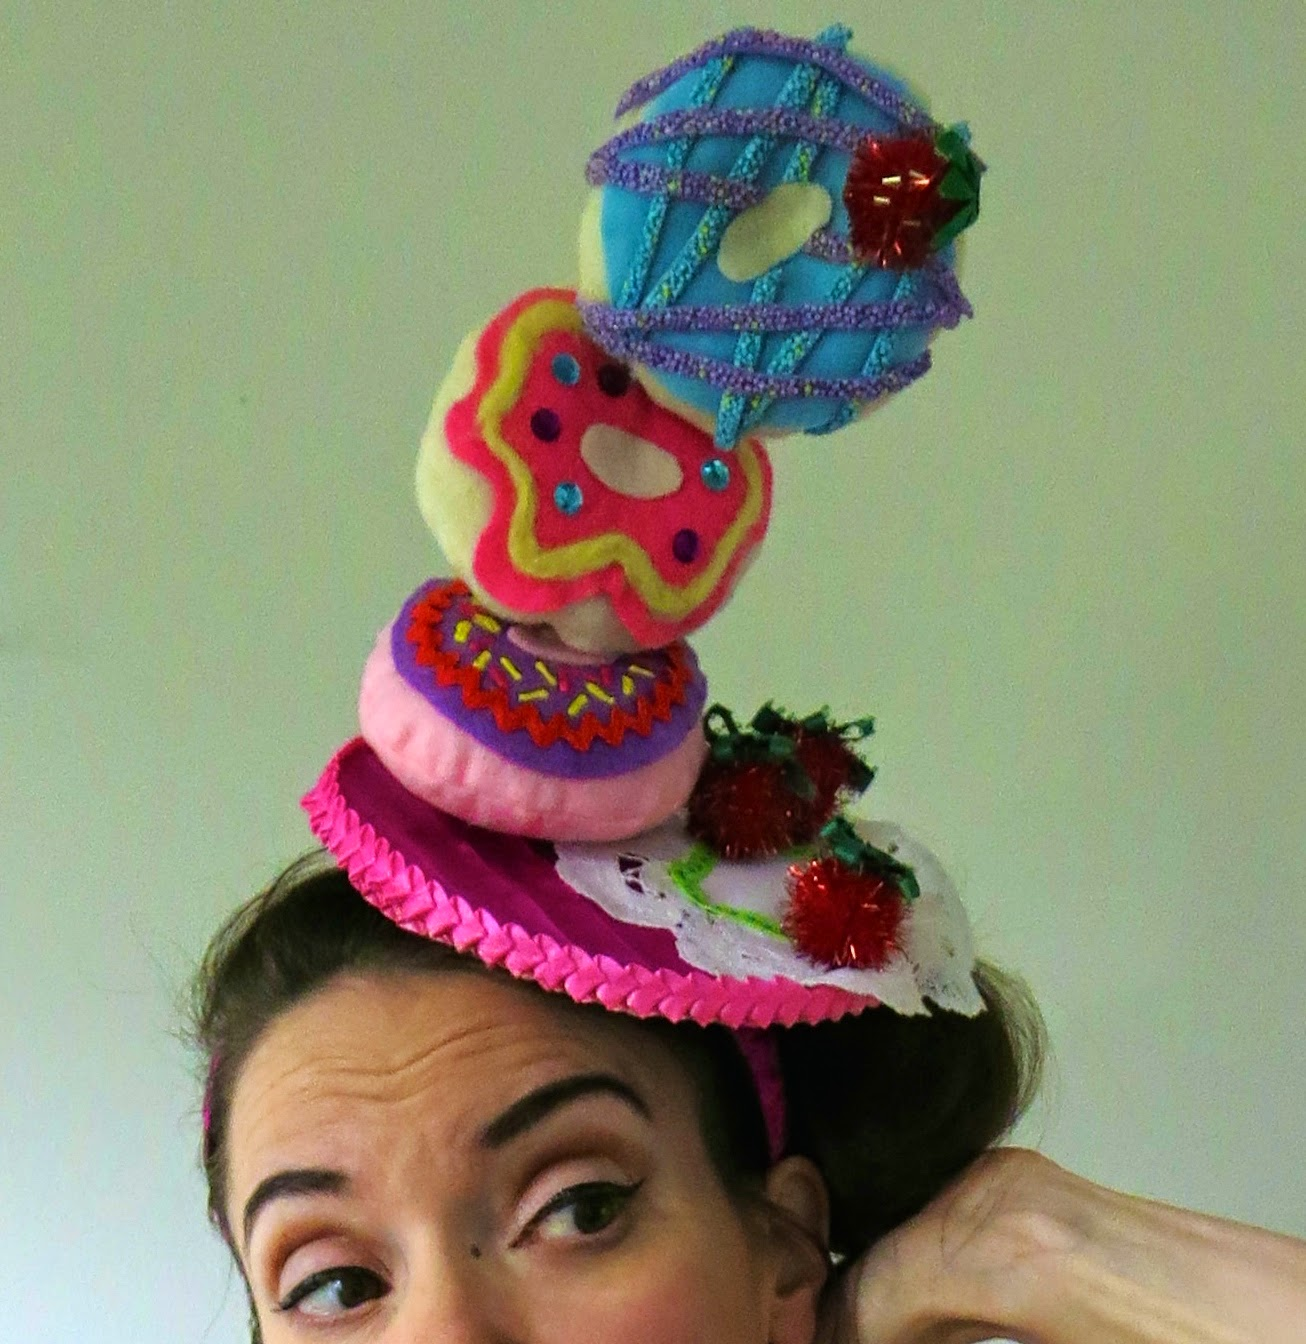 Make Crazy Hats: Cassie Stephens: DIY: A Wayne Theibald-Inspired Donut Hat